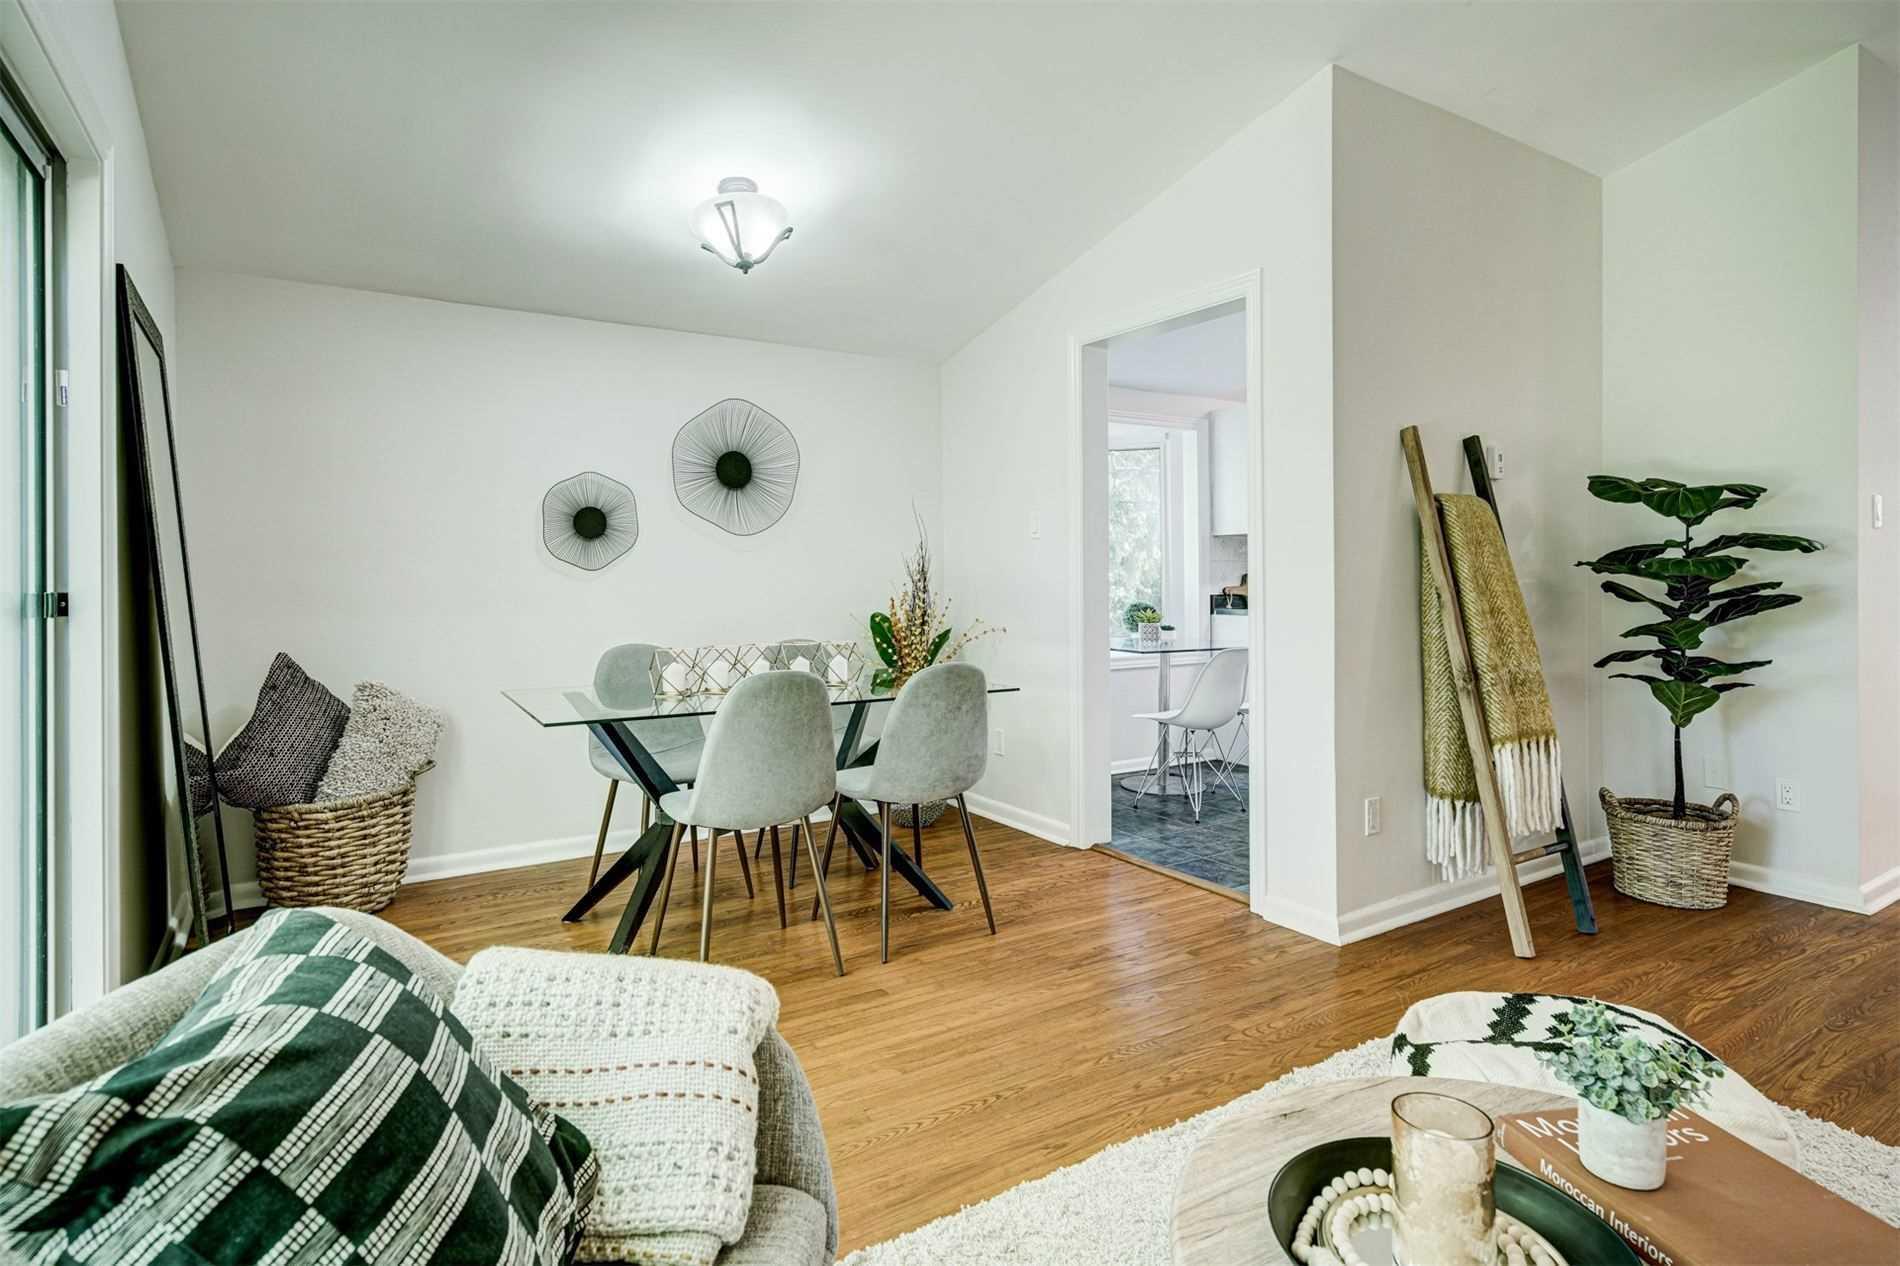 140 Verobeach Blvd - Humbermede Detached for sale, 3 Bedrooms (W5385046) - #8